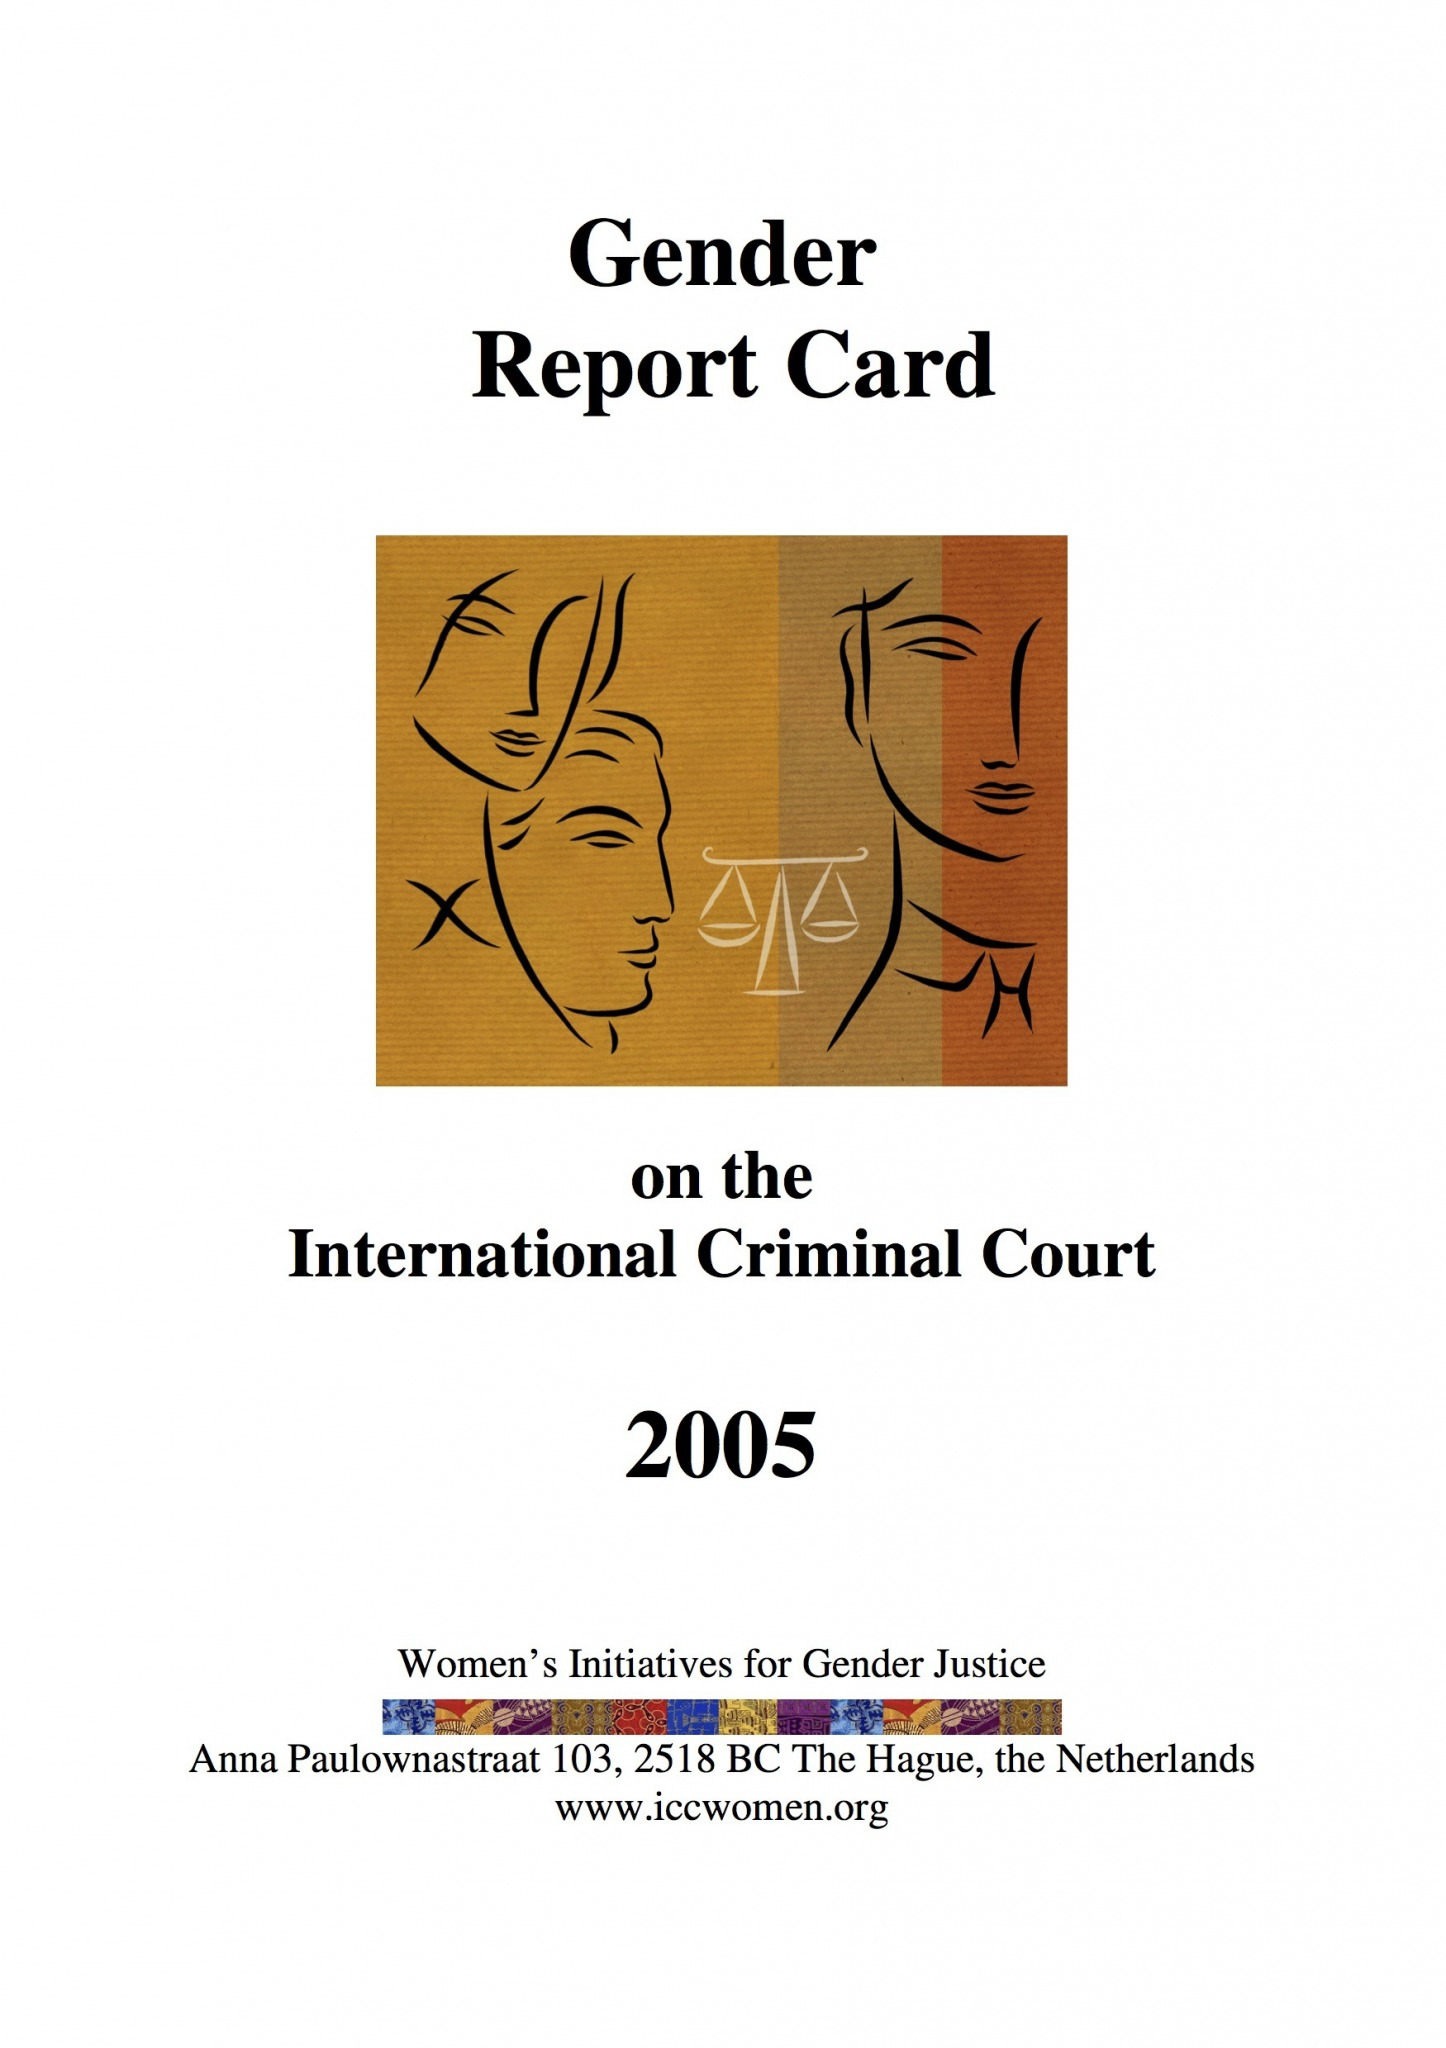 nafta and gender reports pdf 2013